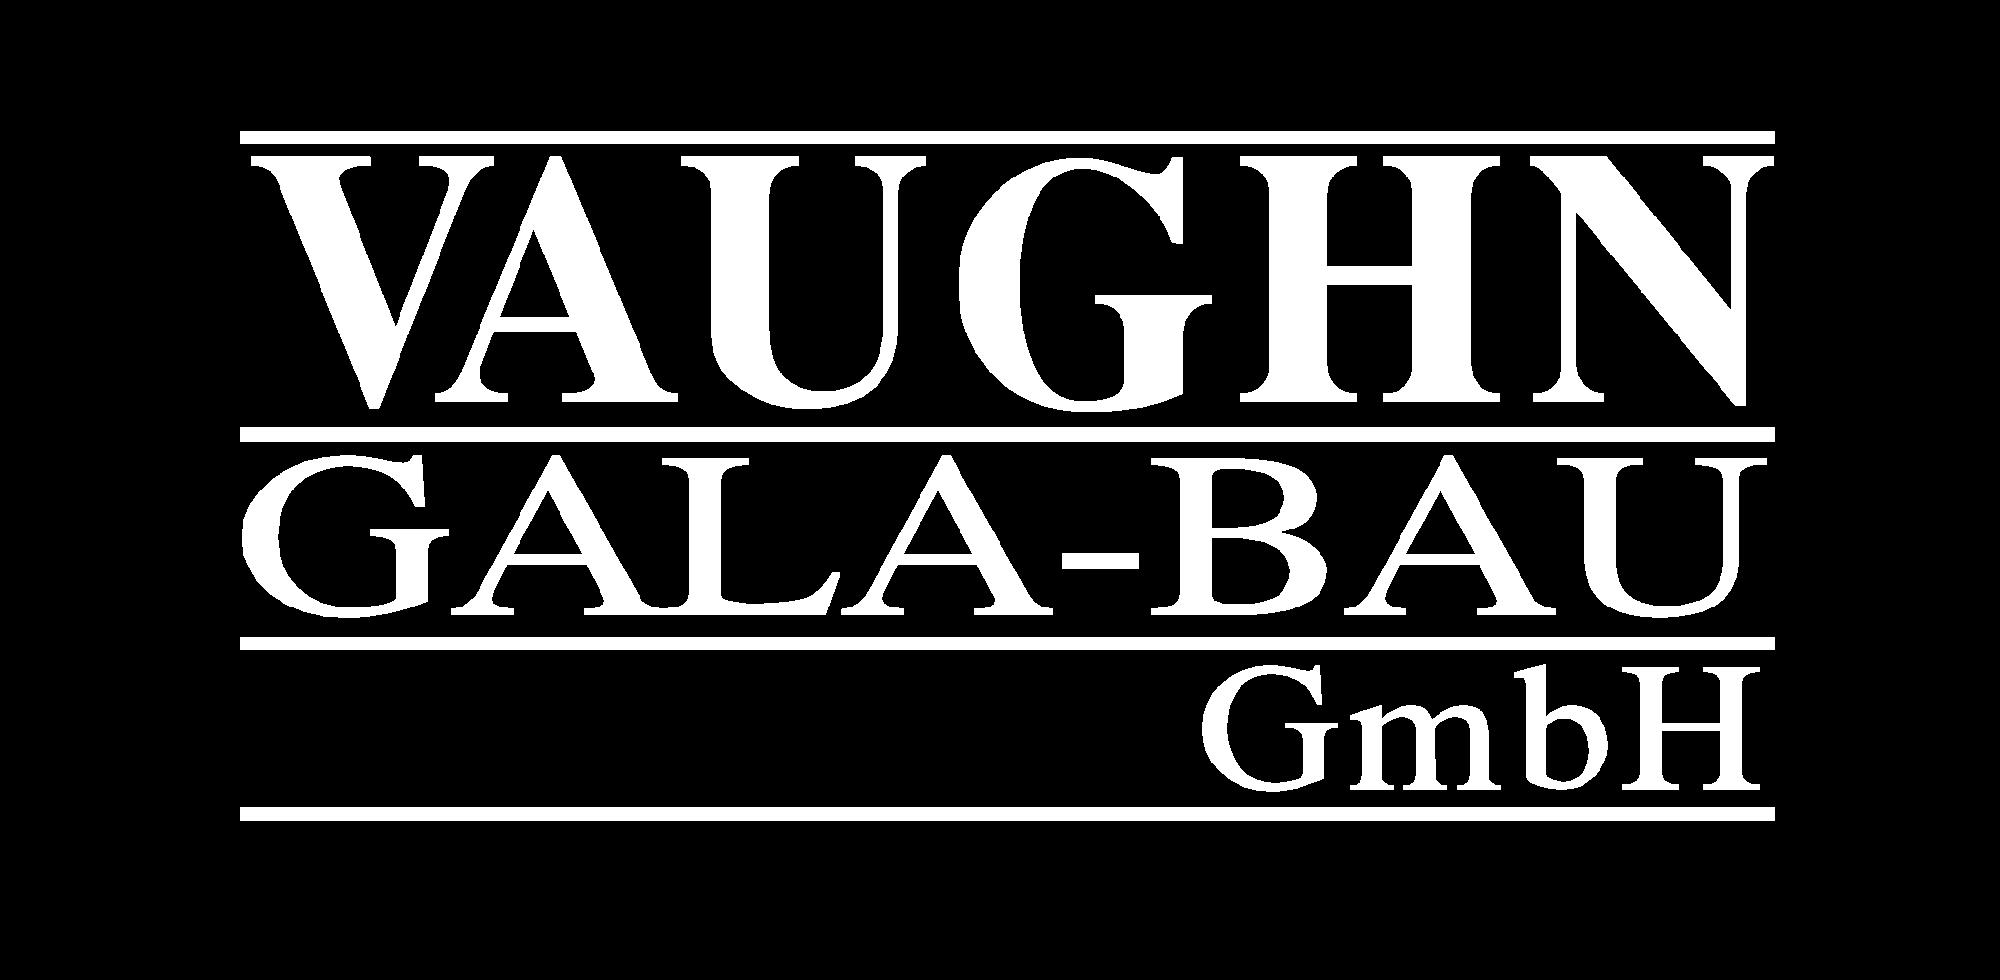 Vaughn GaLa-Bau